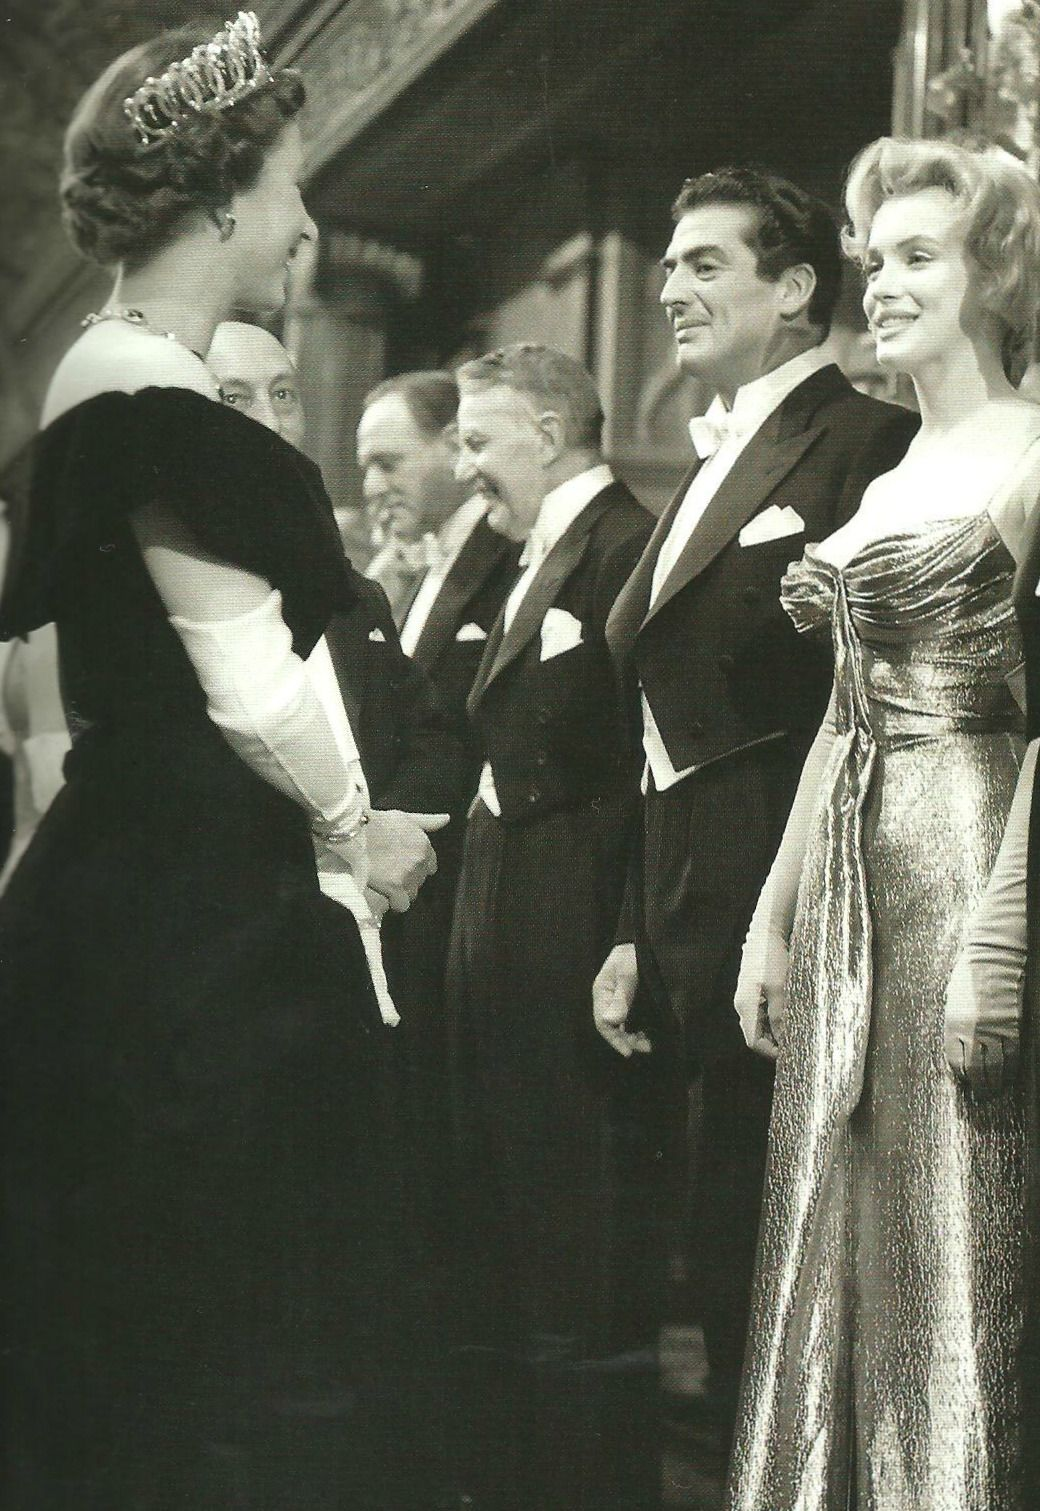 Marilyn Monroe Meeting Queen Elizabeth Ii At The Empire Theatre In